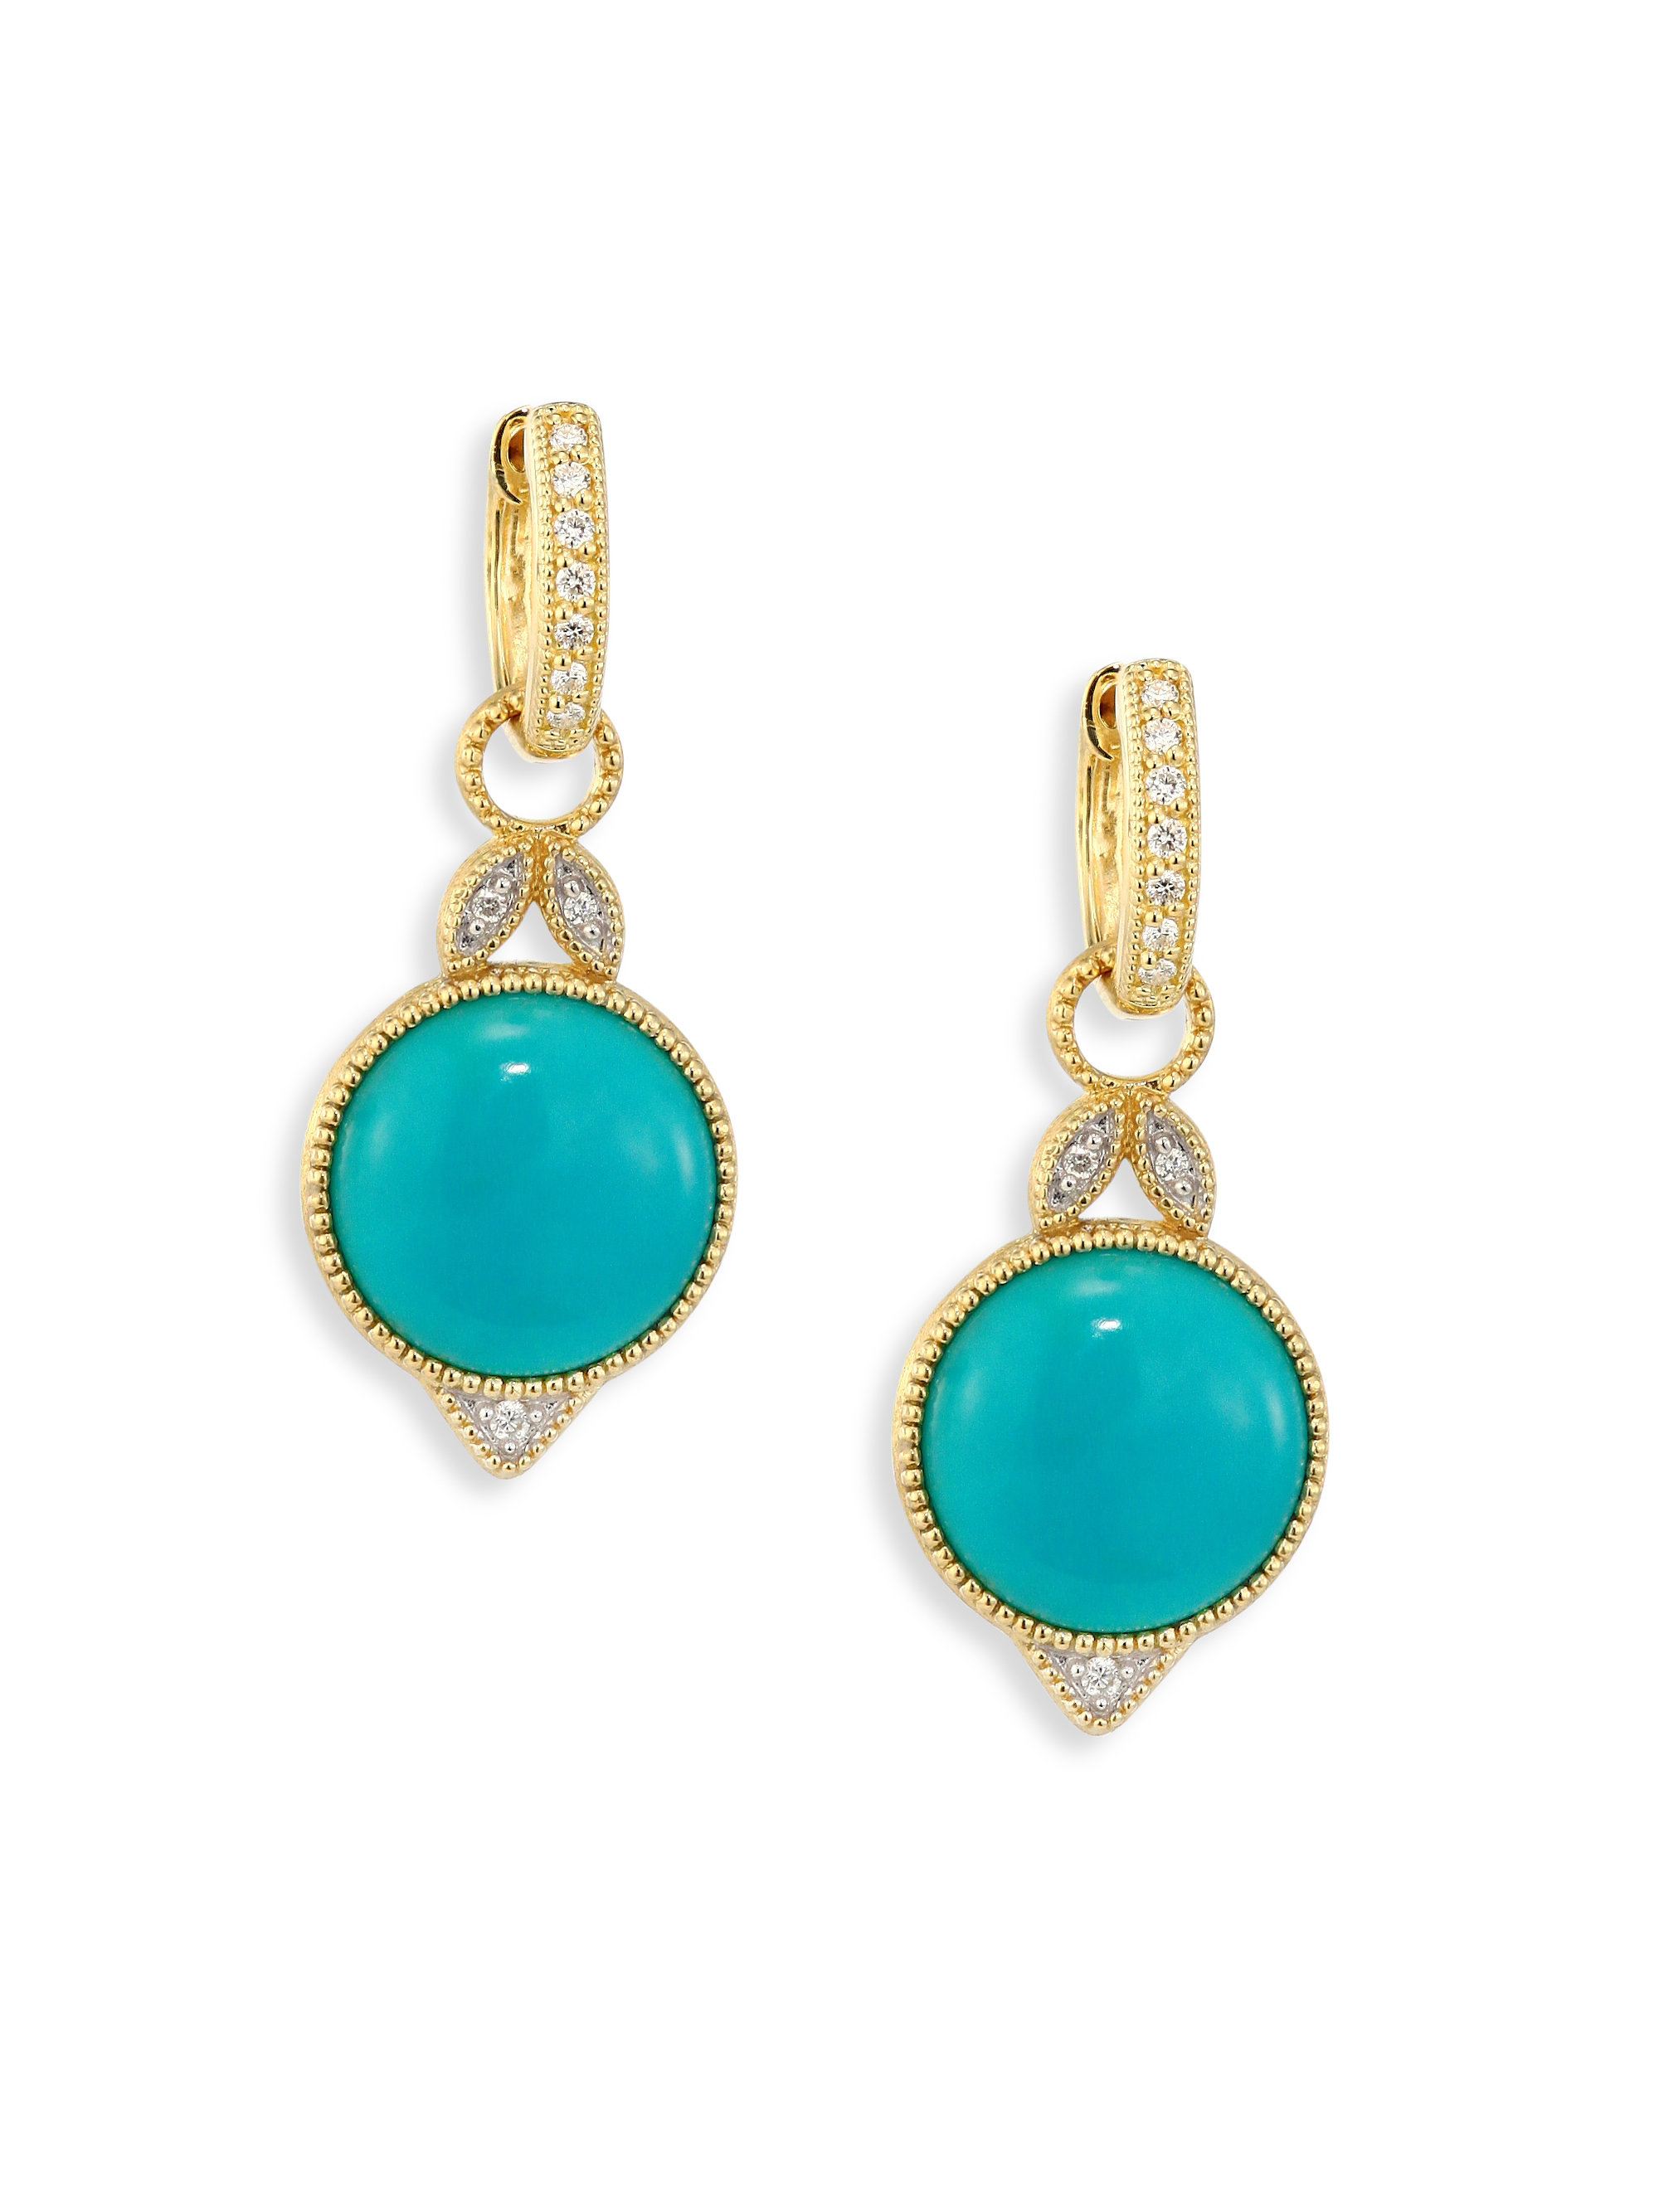 jude frances lisse diamond turquoise 18k yellow gold. Black Bedroom Furniture Sets. Home Design Ideas